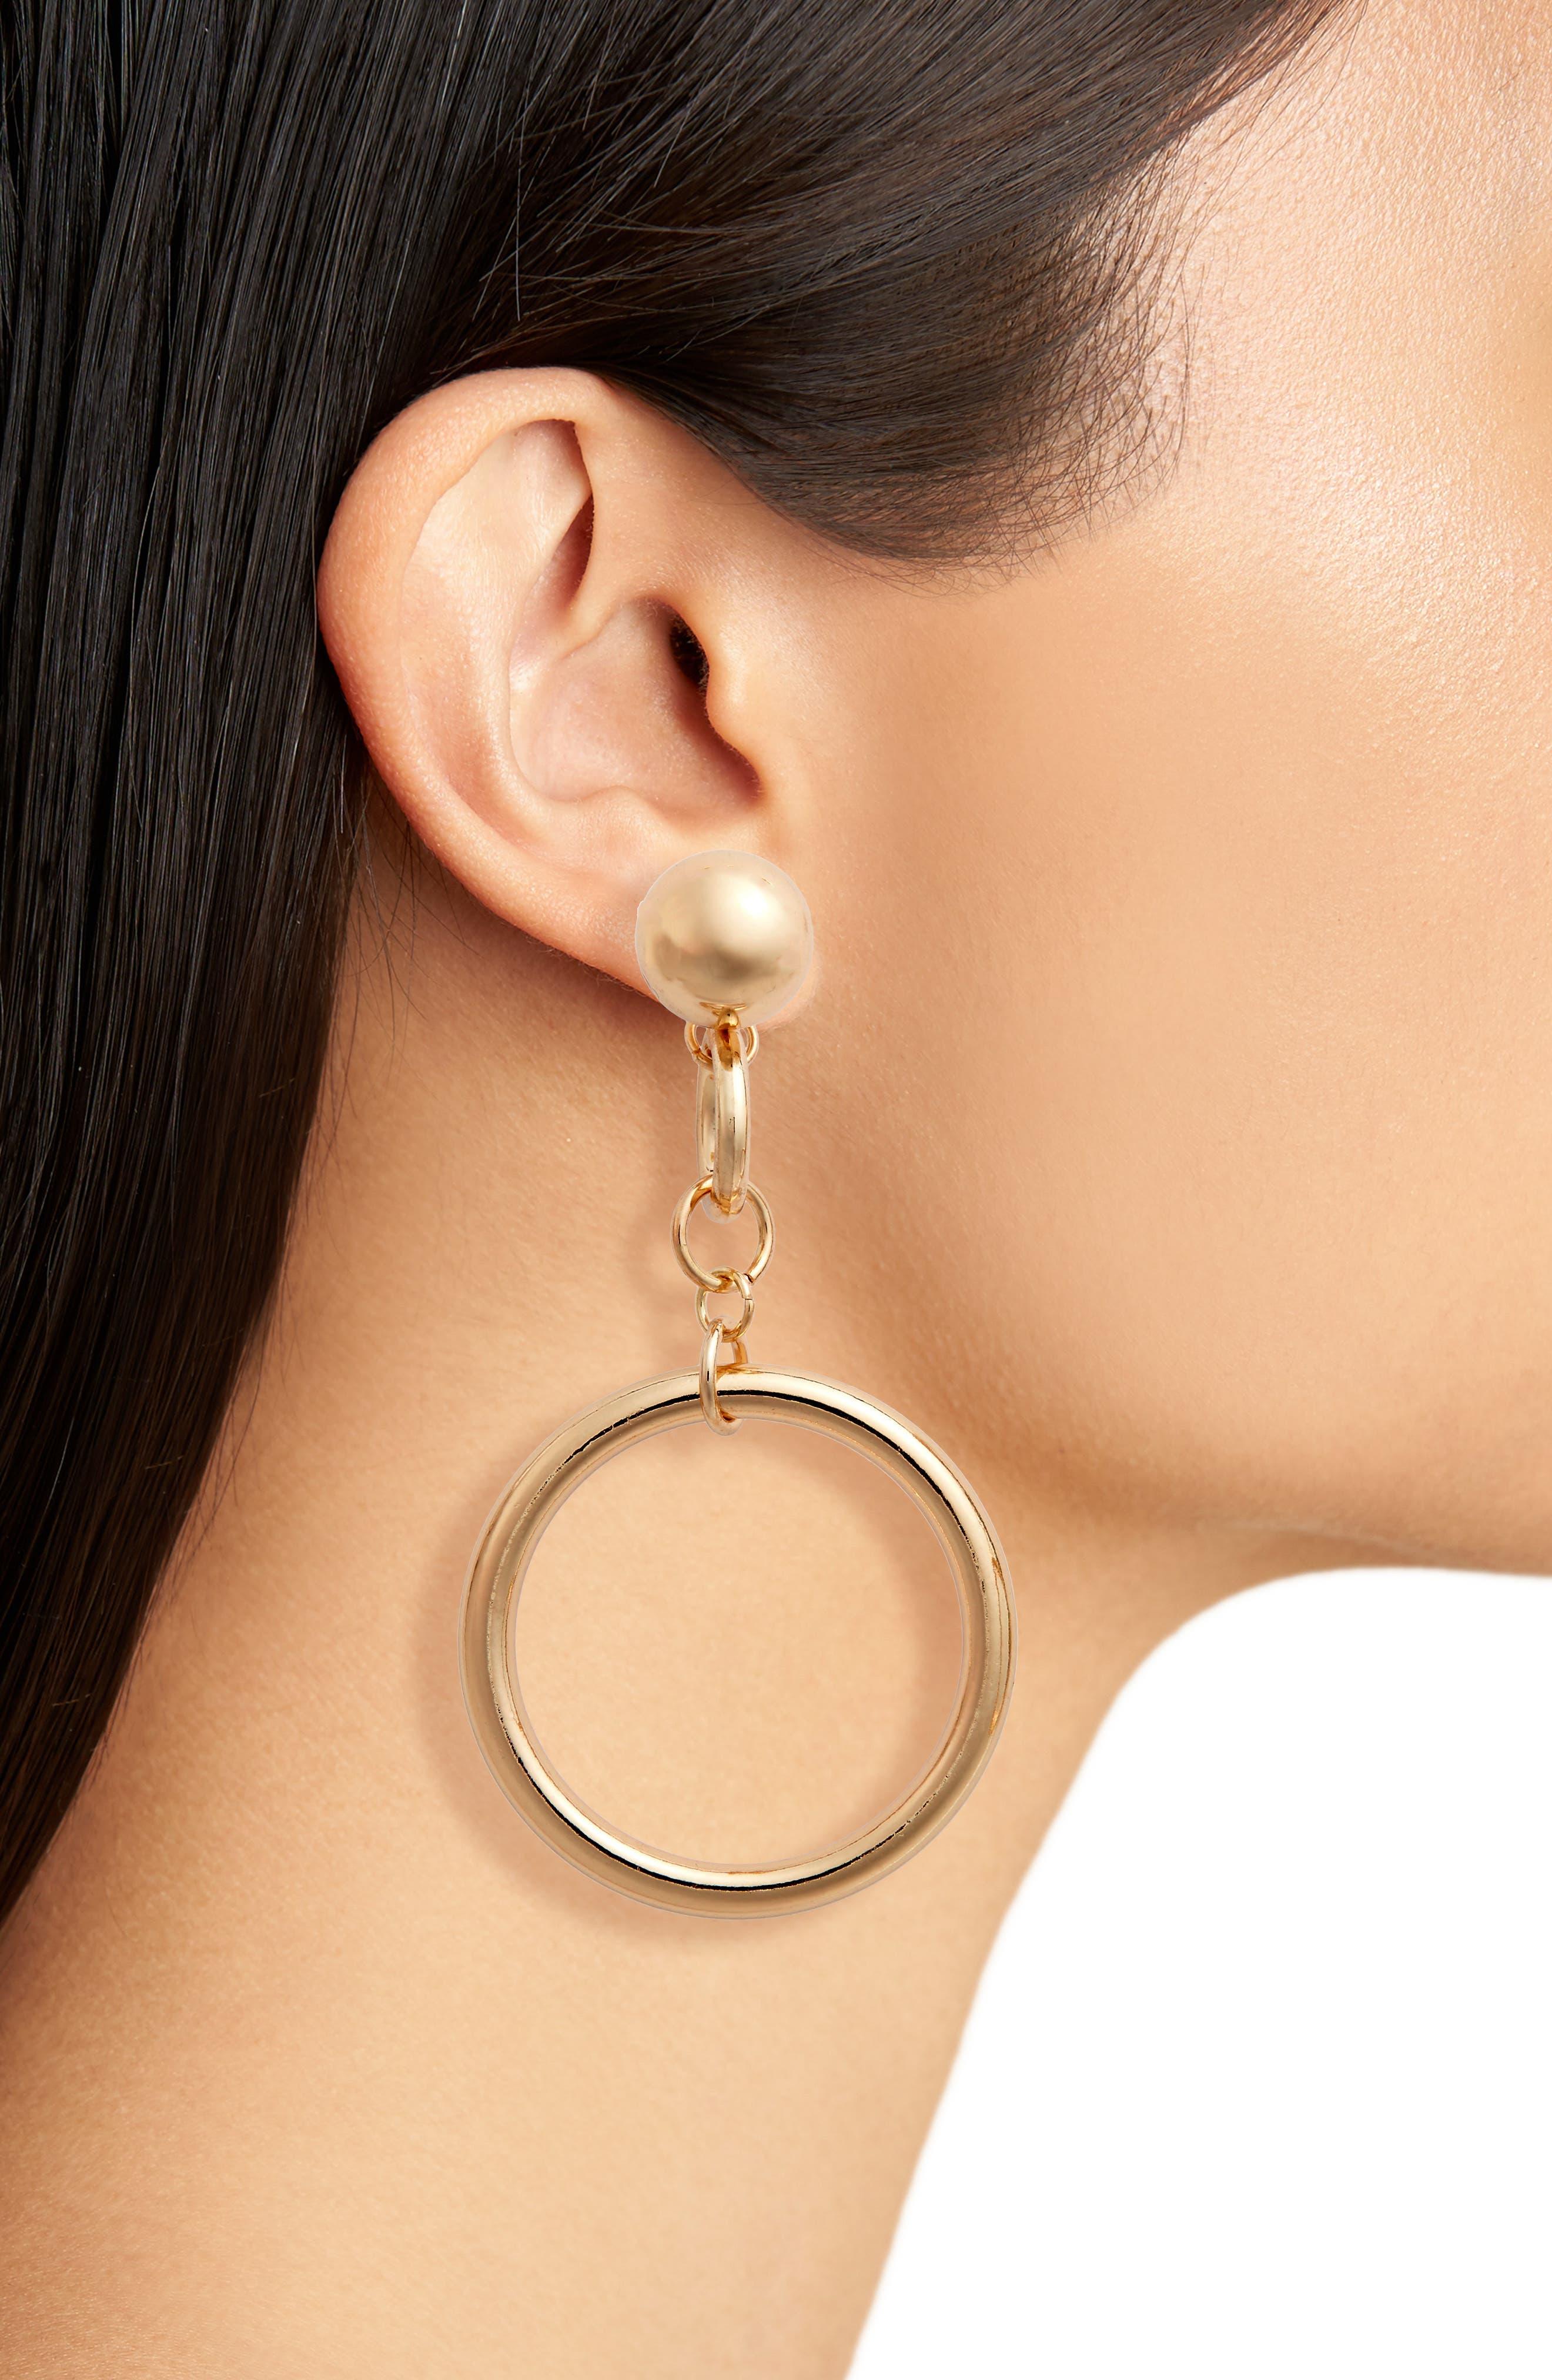 Ball Chain Drop Earrings,                             Alternate thumbnail 2, color,                             710